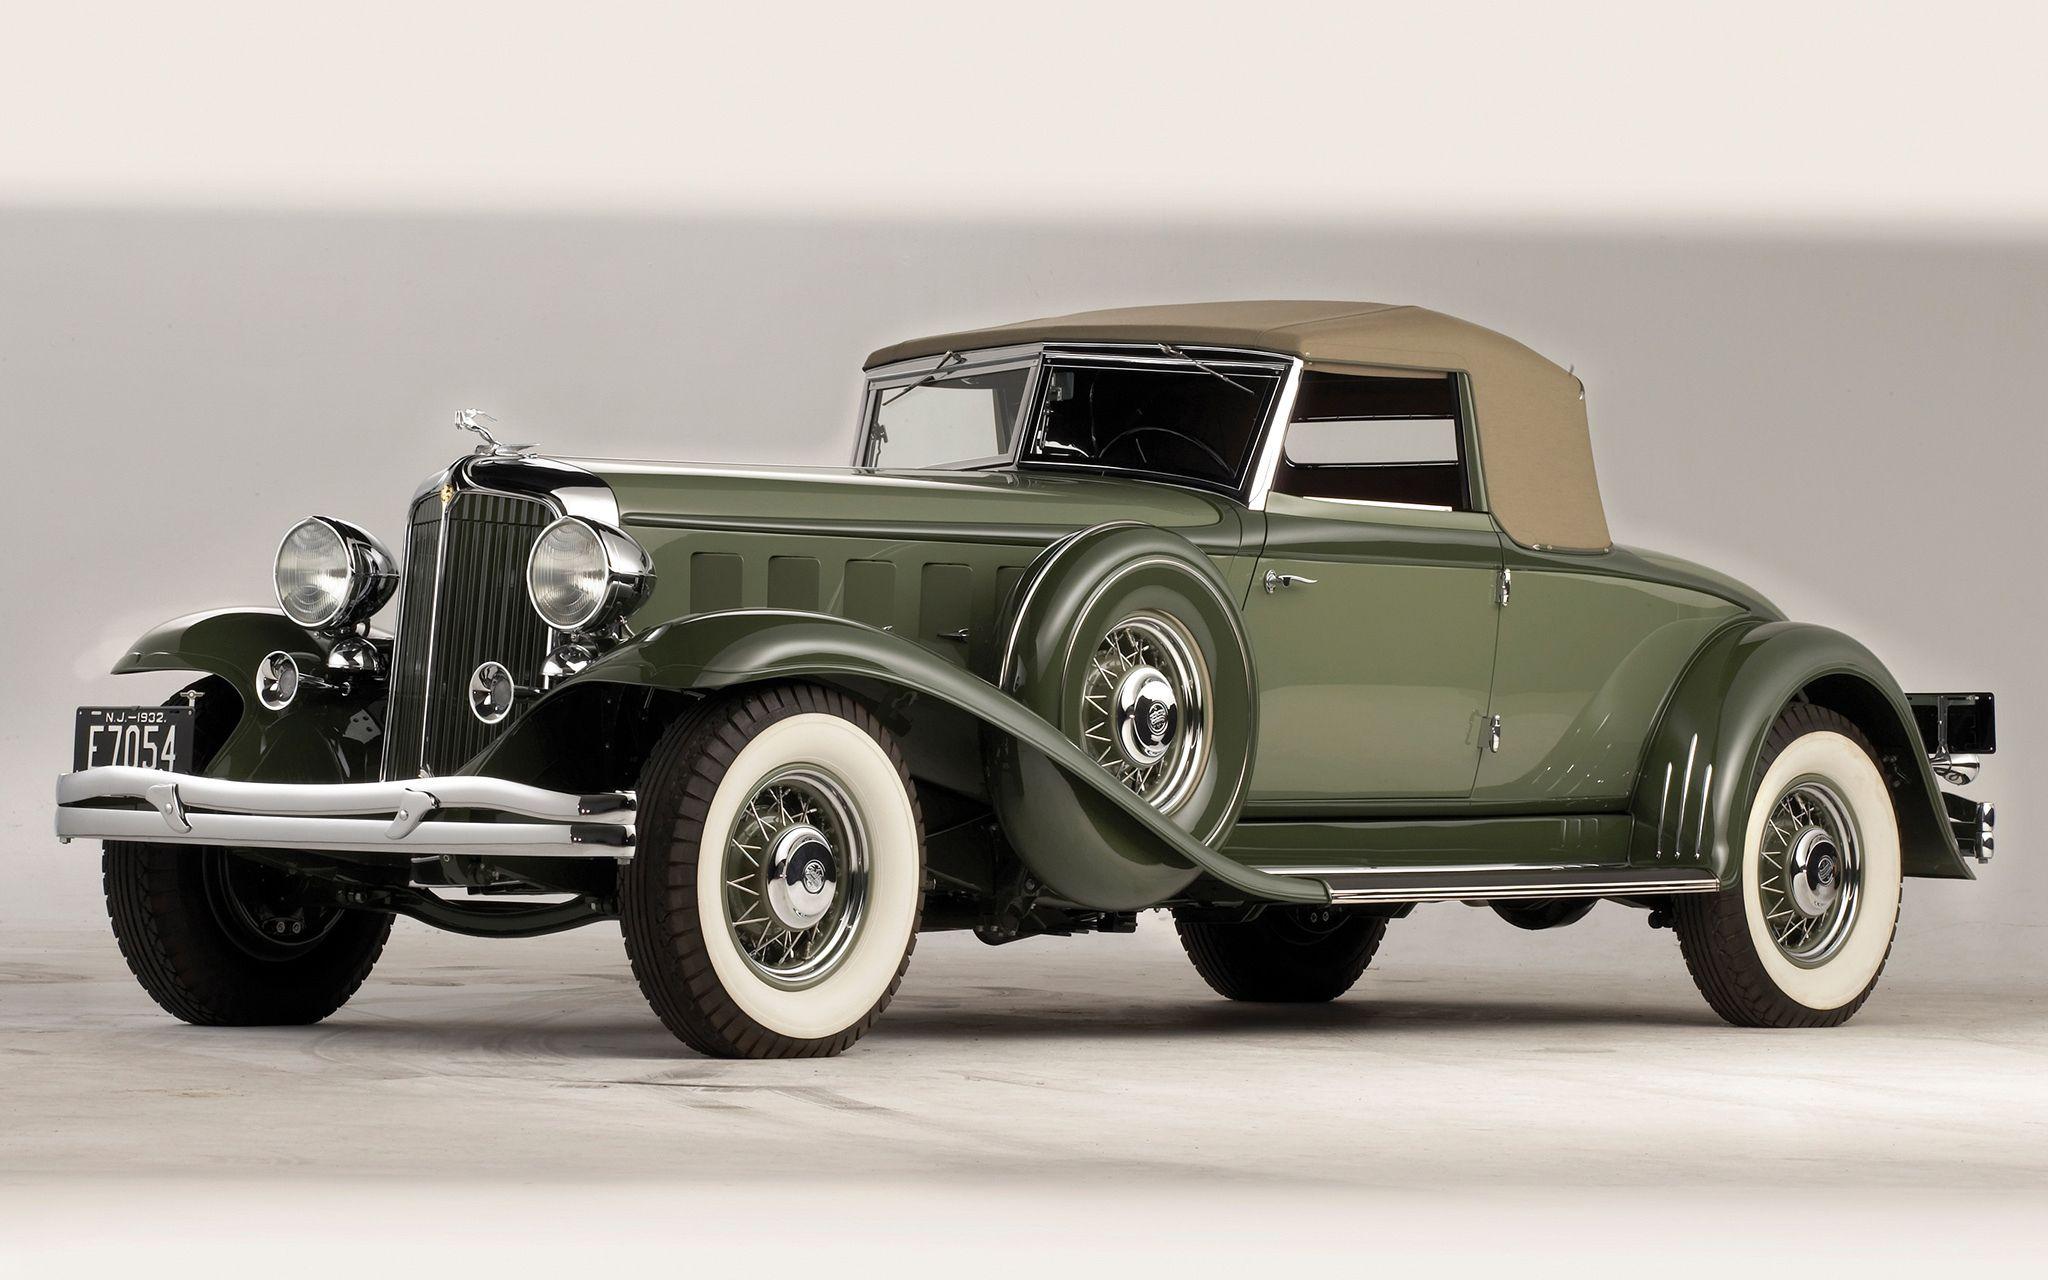 classic car wallpaper clasic car pinterest car wallpapers rh pinterest com